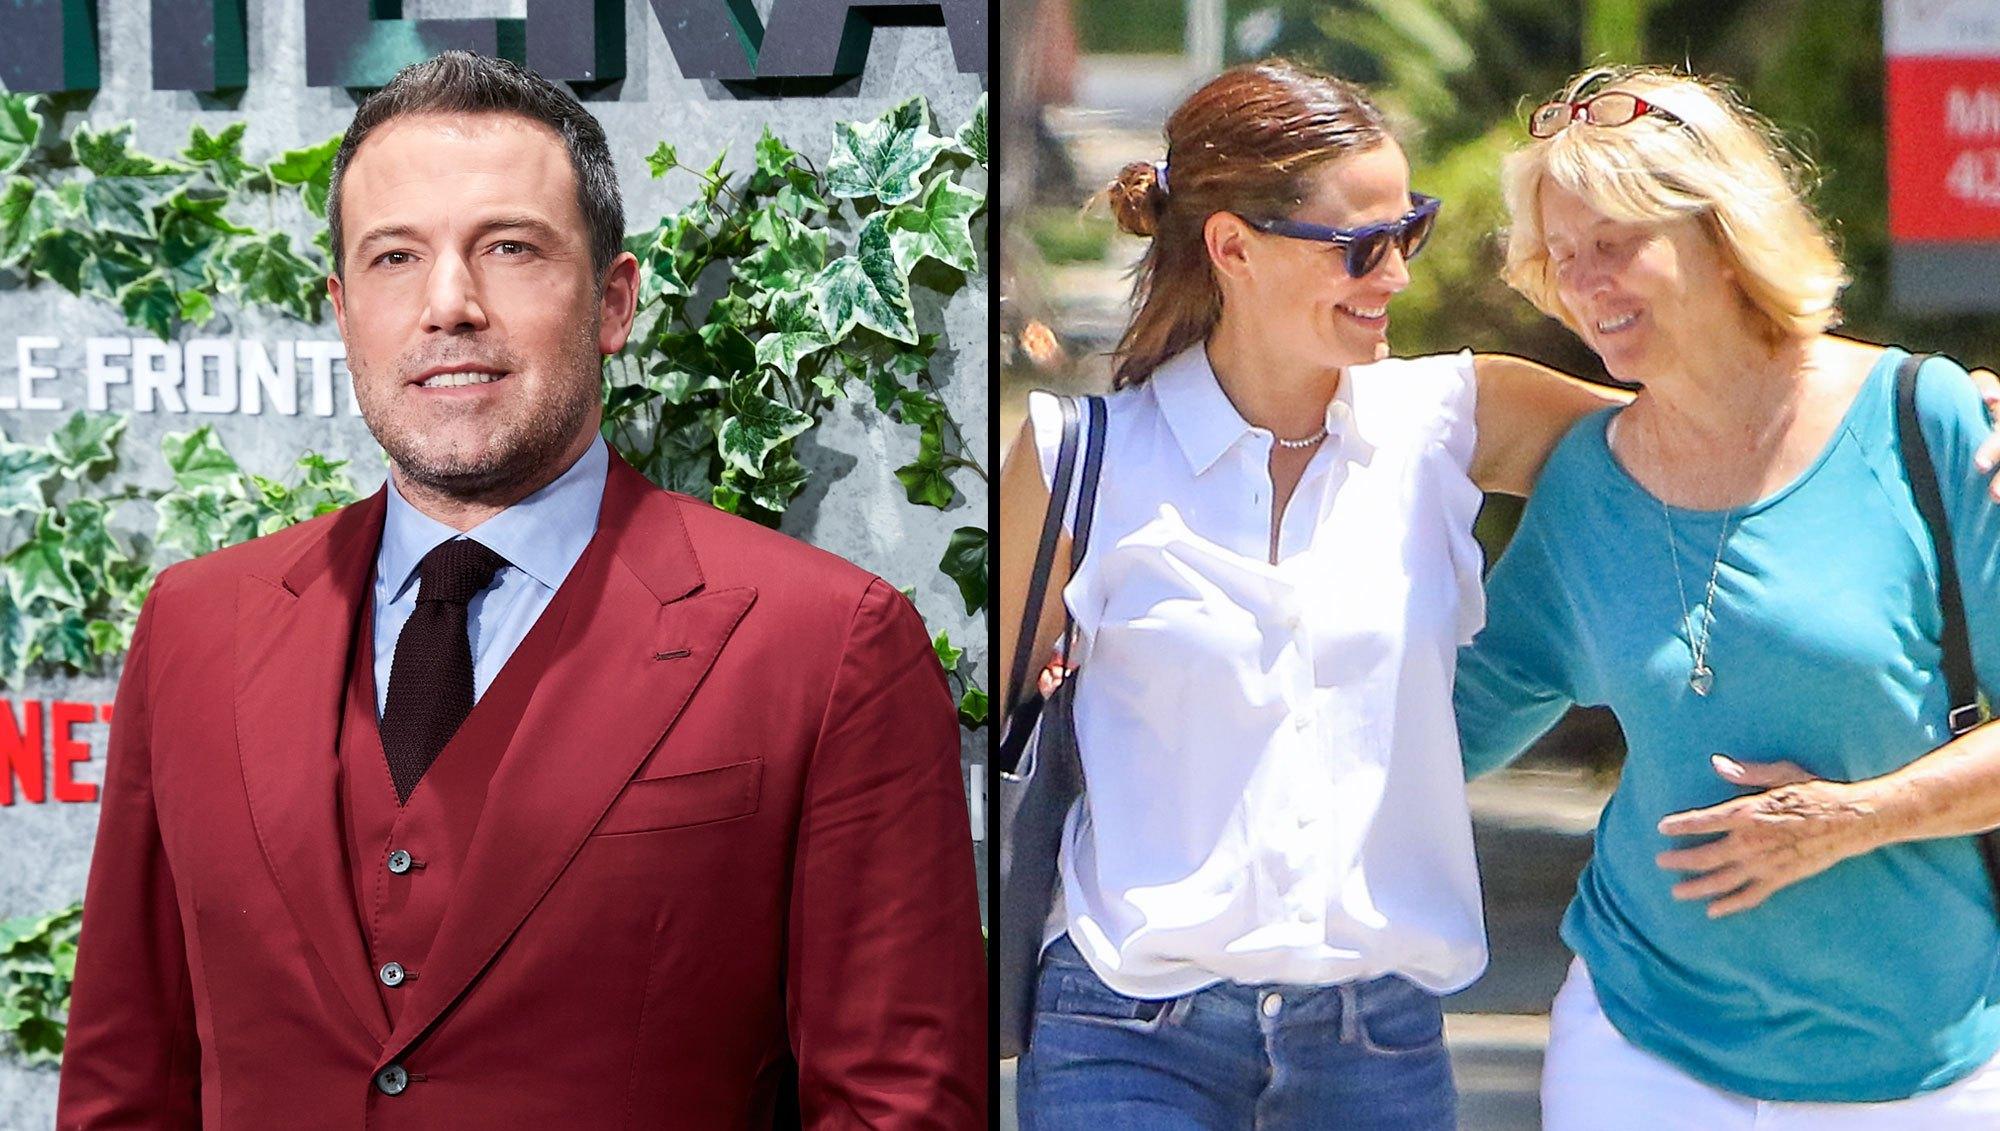 Ben Affleck Pays Tribute to 'Incredible' Ex-Wife Jennifer Garner, Mom Christine